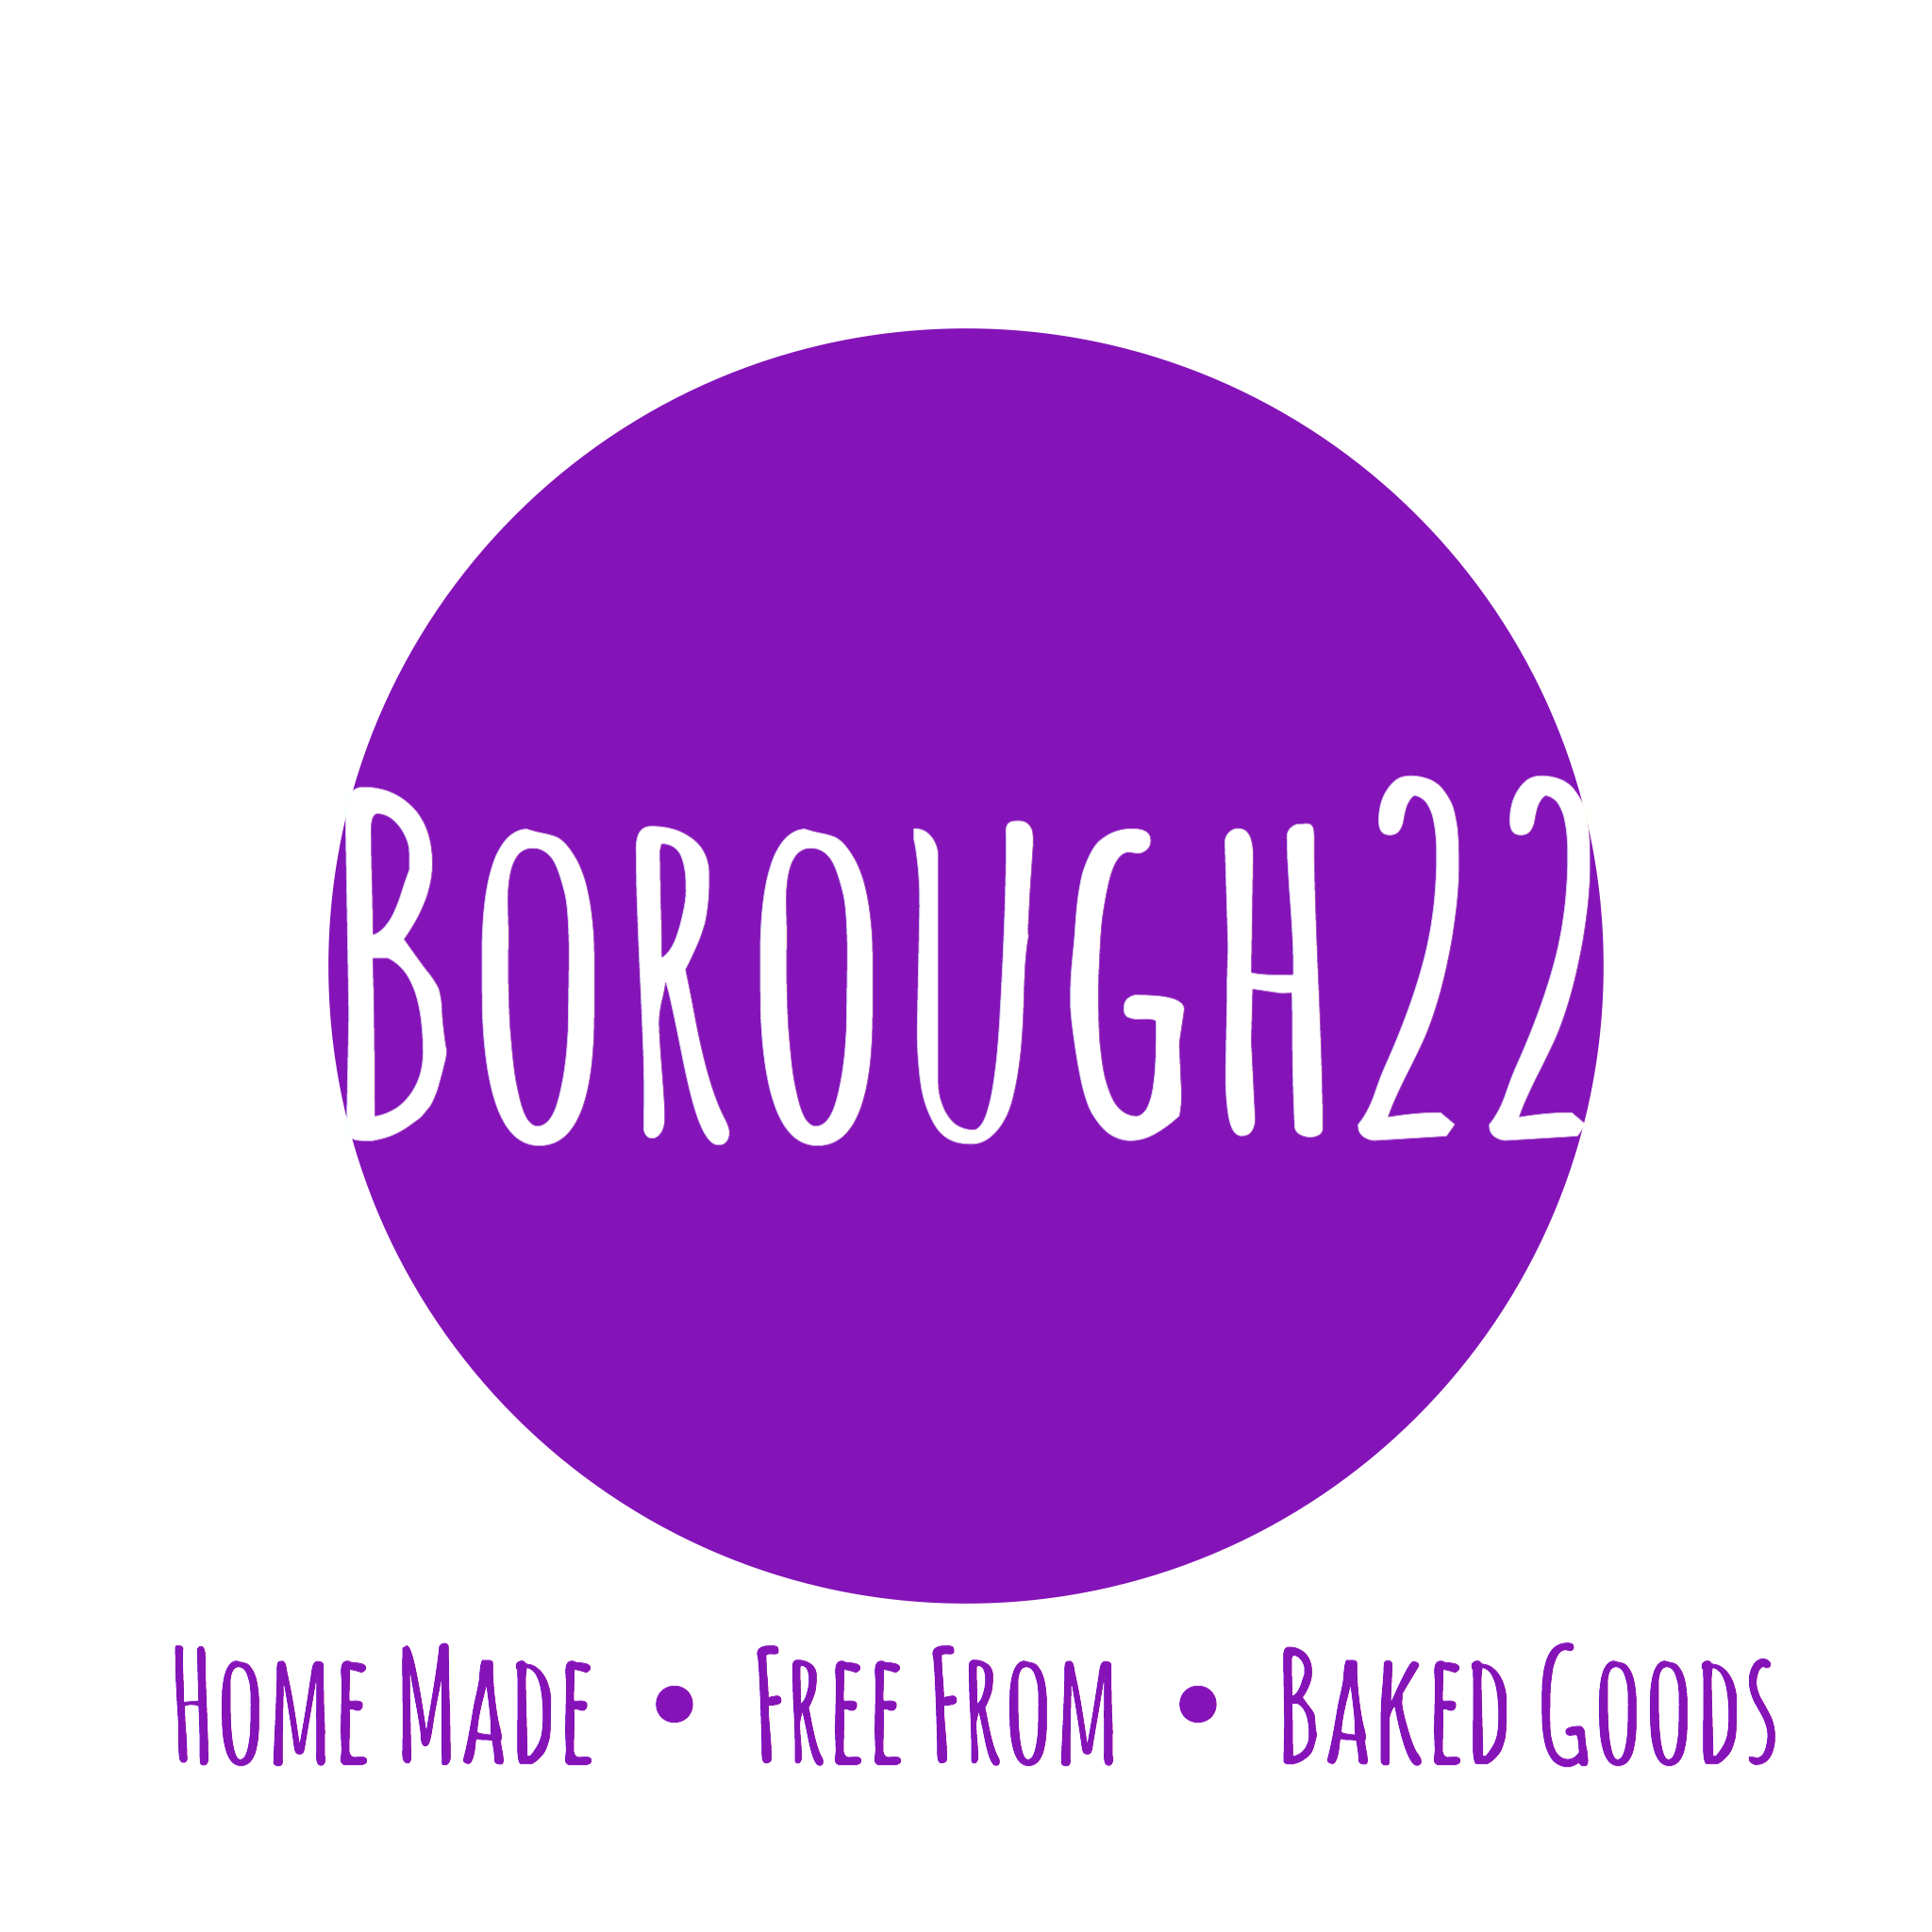 Photo of Borough 22